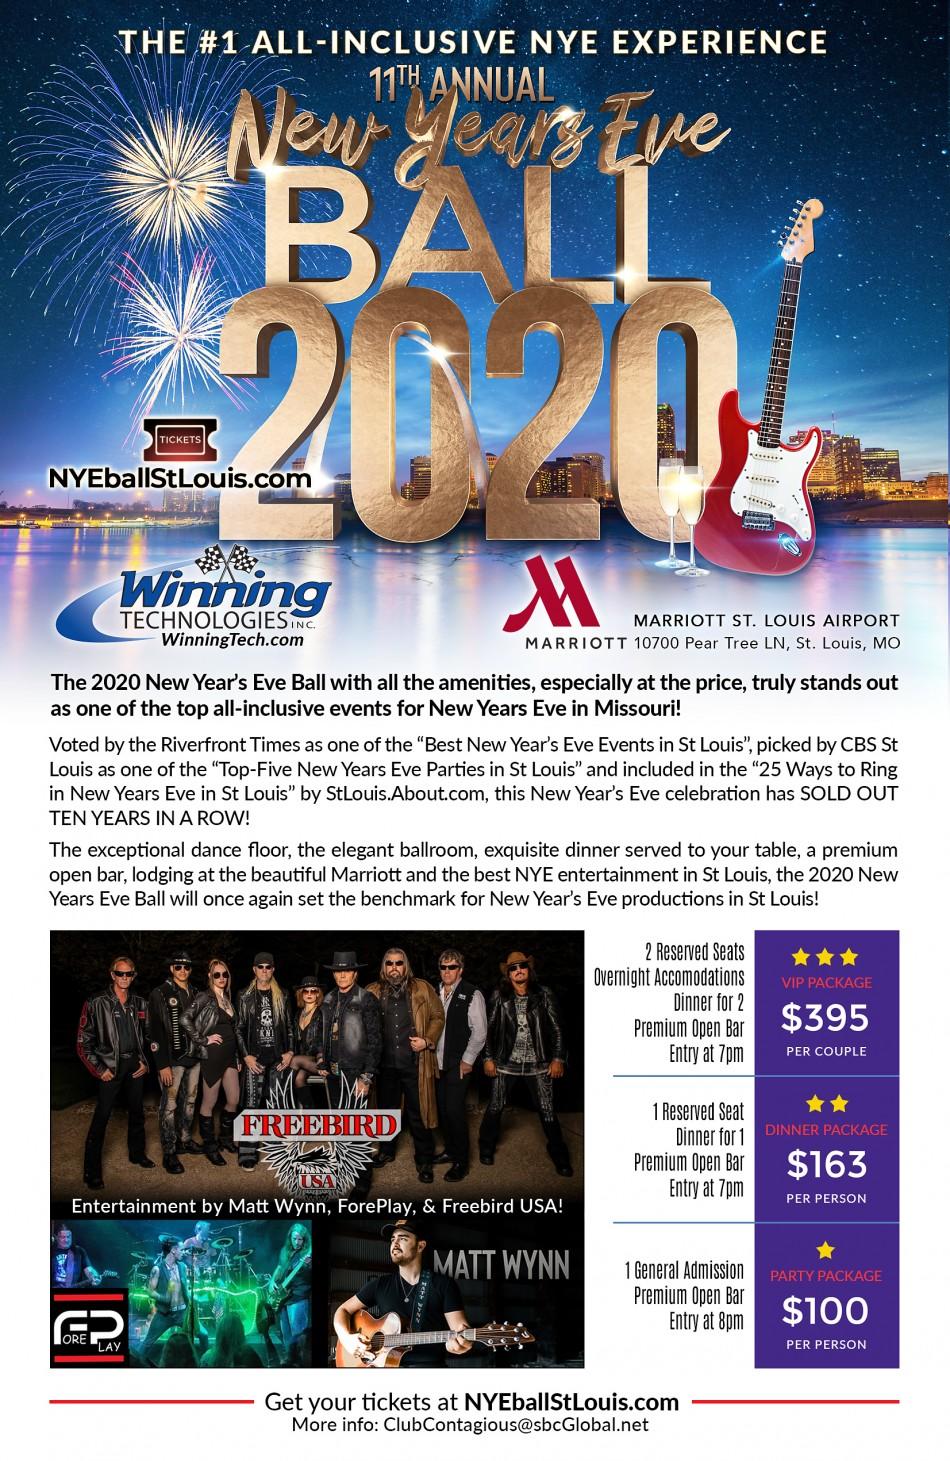 2020 New Years Eve Ball